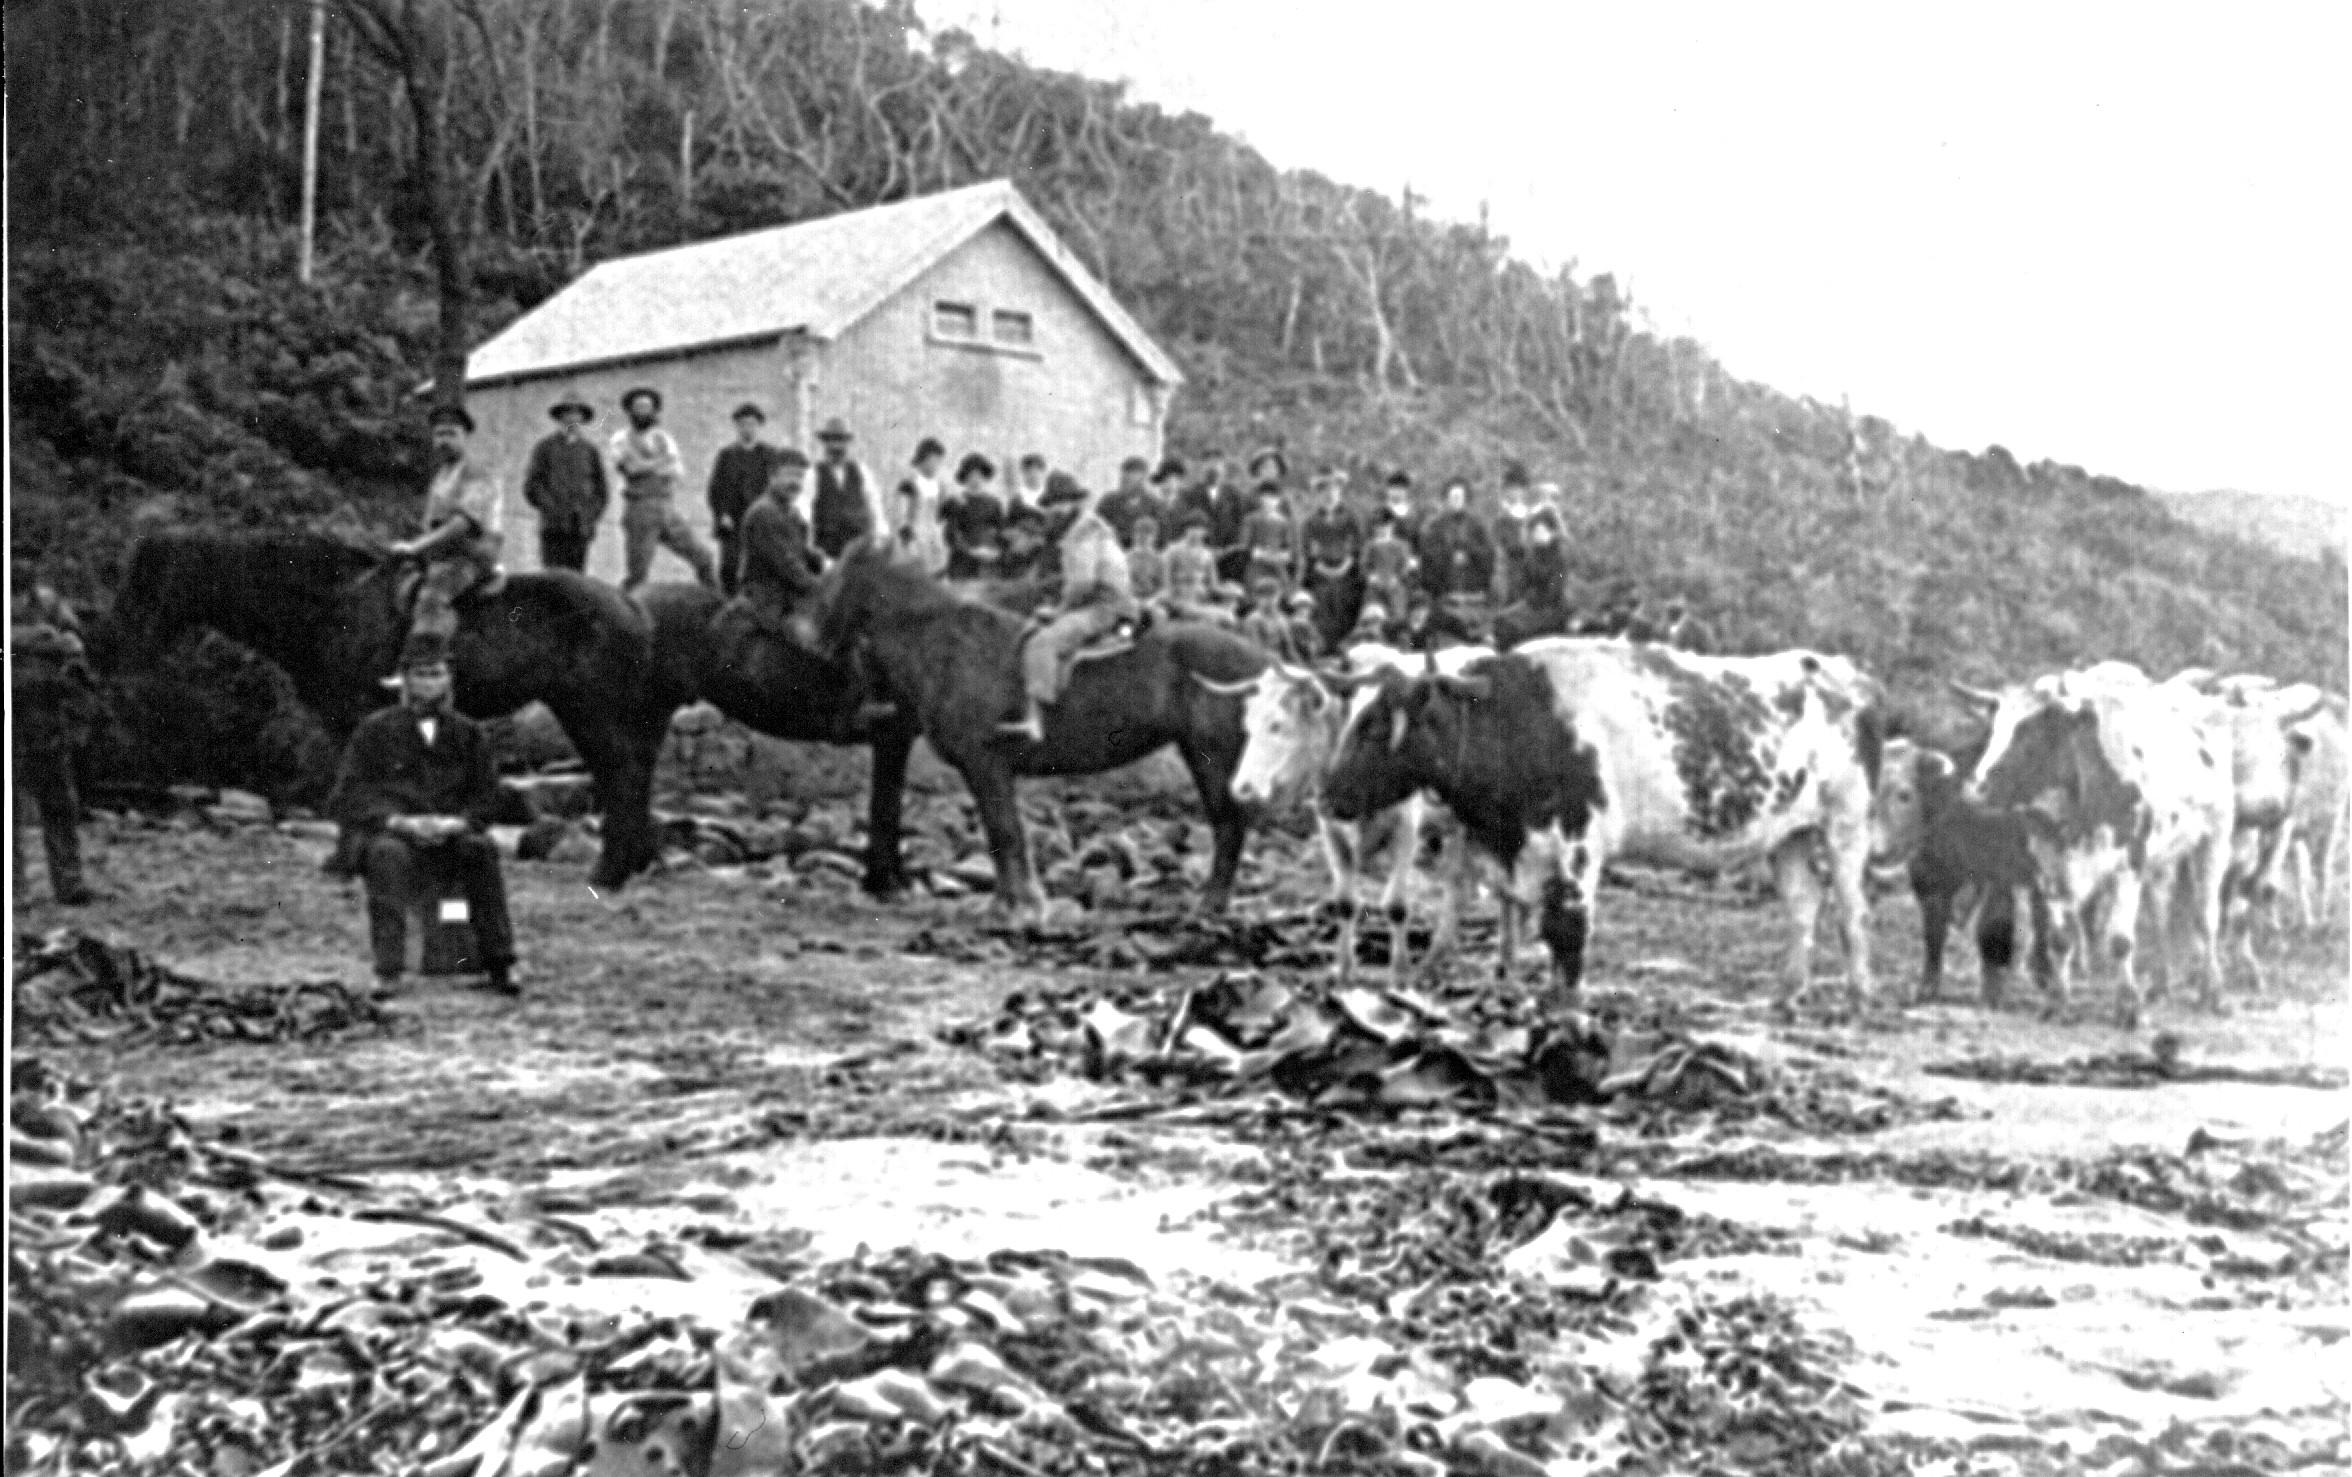 Blanket Bay 1877